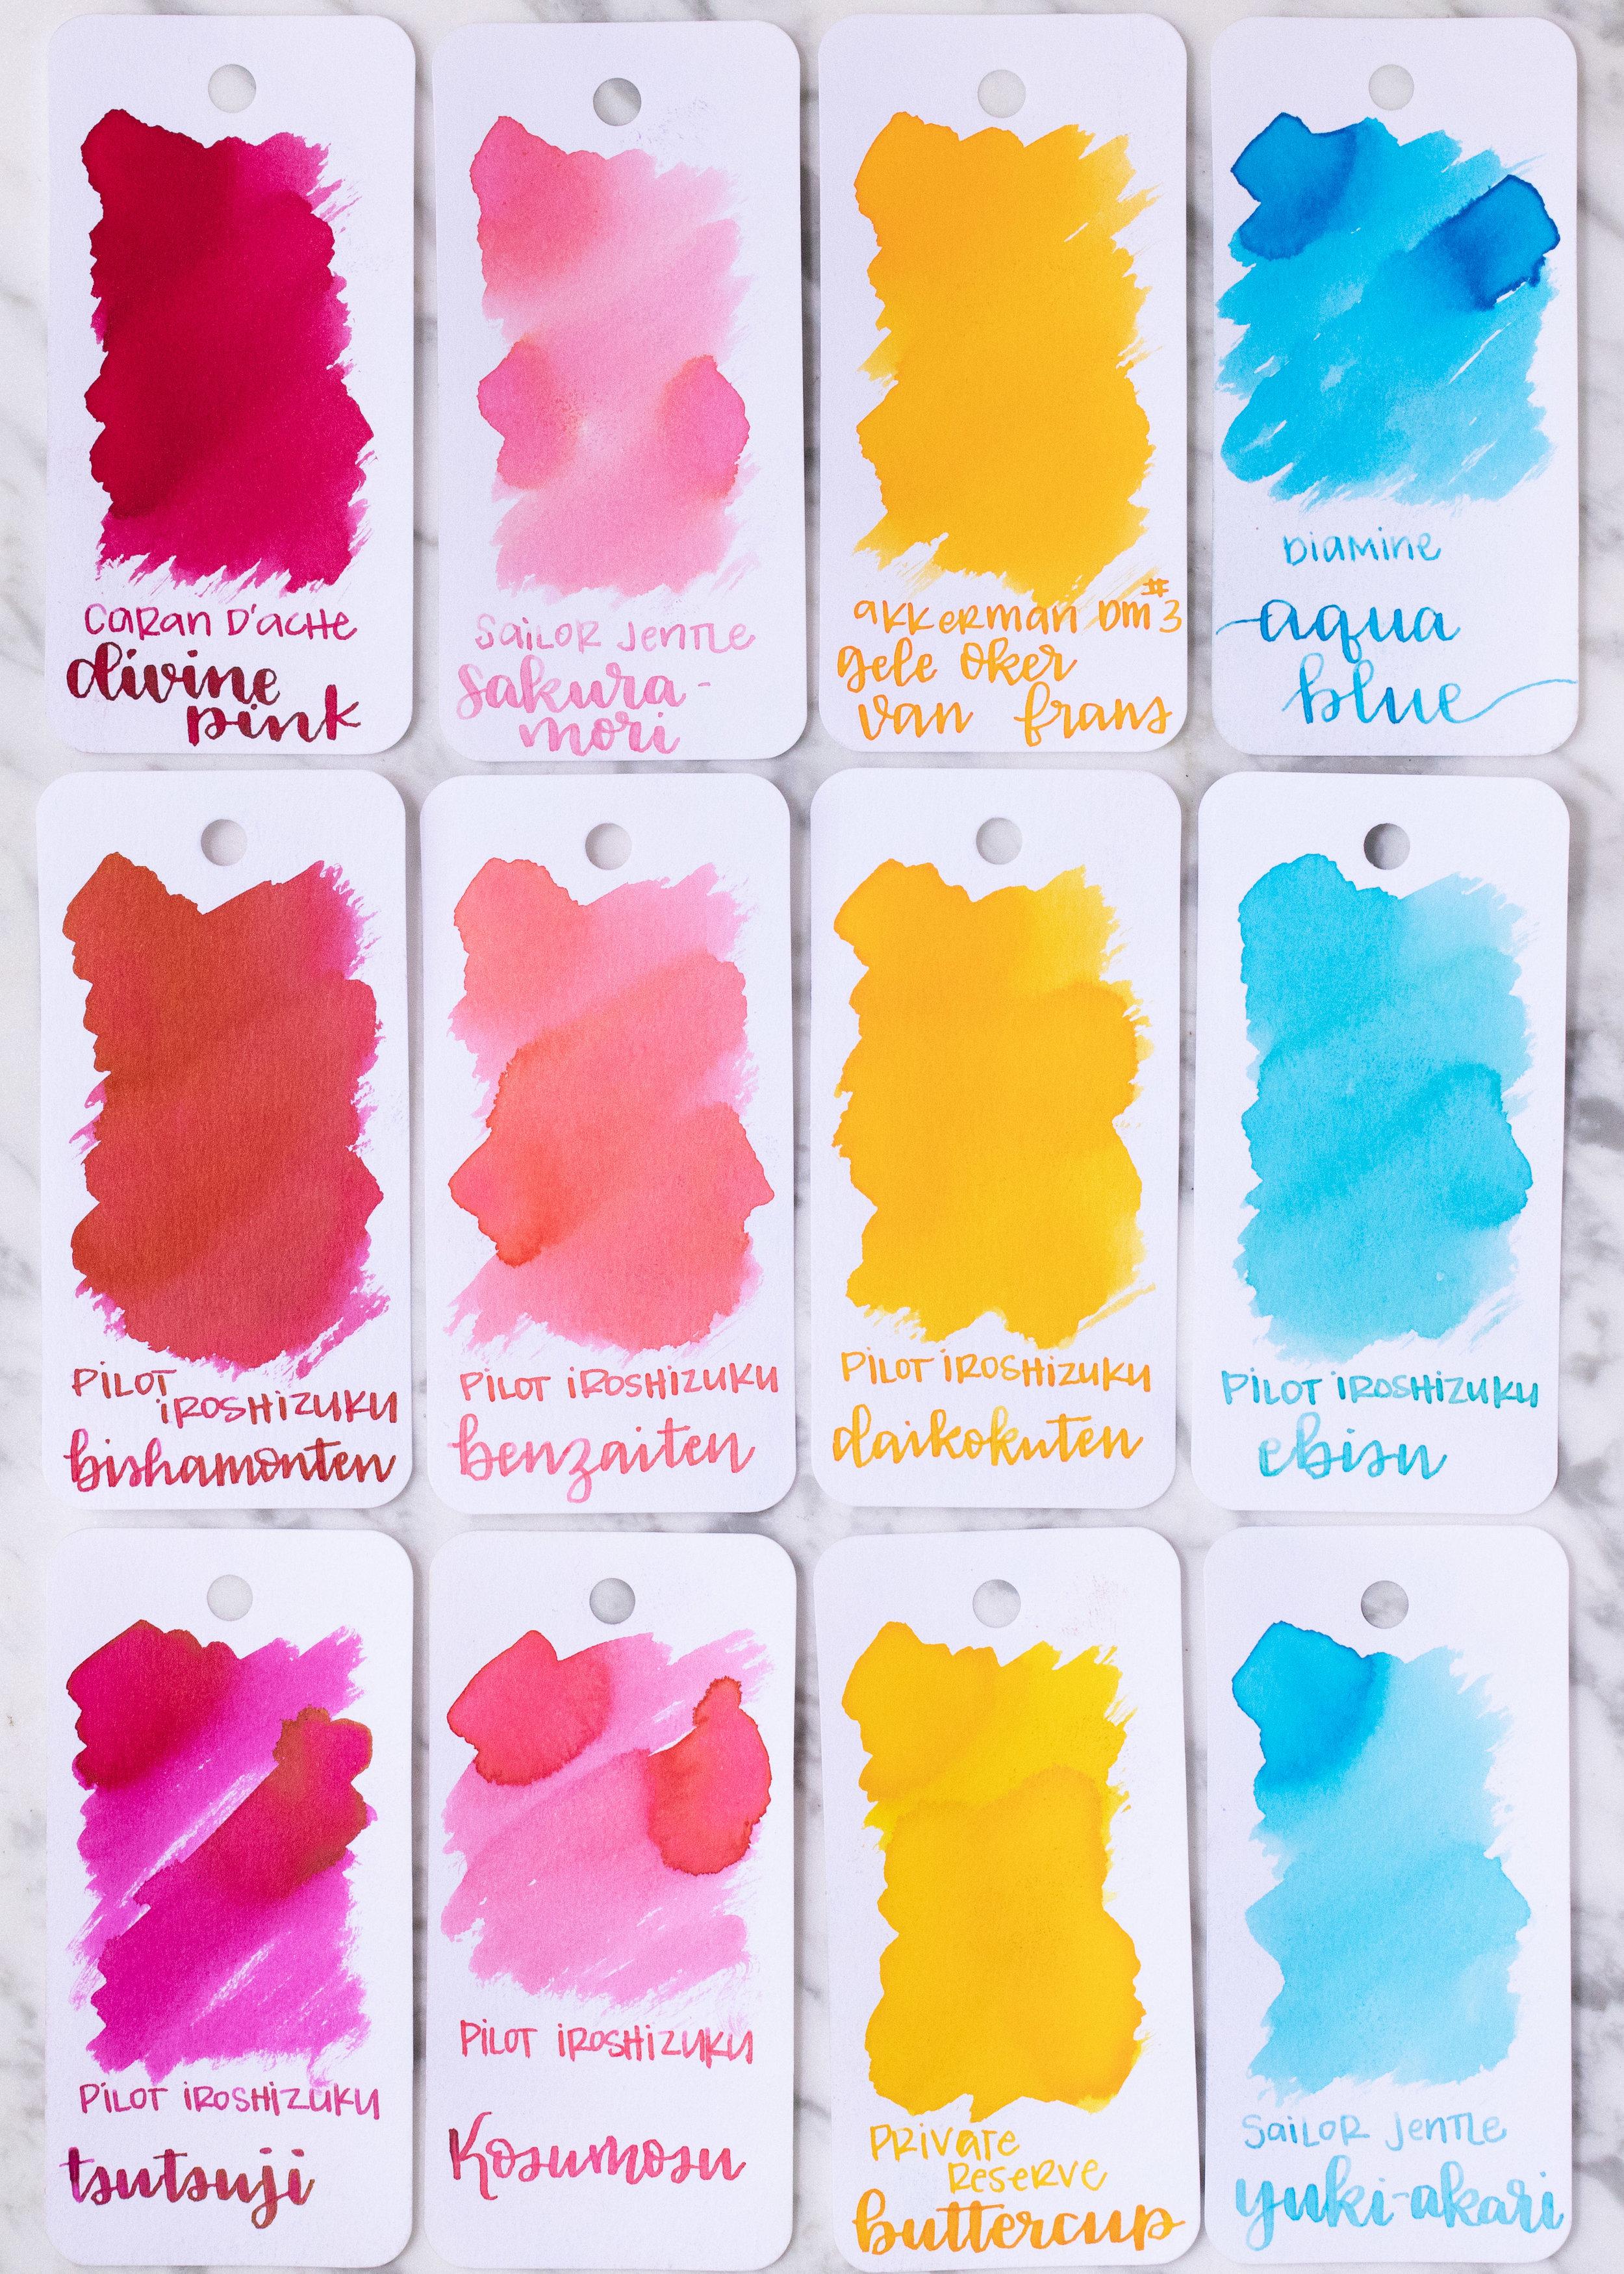 Similar inks: - Bishamonten is closest to Caran D'arche Divine Pink. Benzaiten is much warmer than Kosumosu. Daikokuten is close to Akkerman Gele Oker van Frans. Ebisu is similar to Sailor Jentle Yuki-akari.